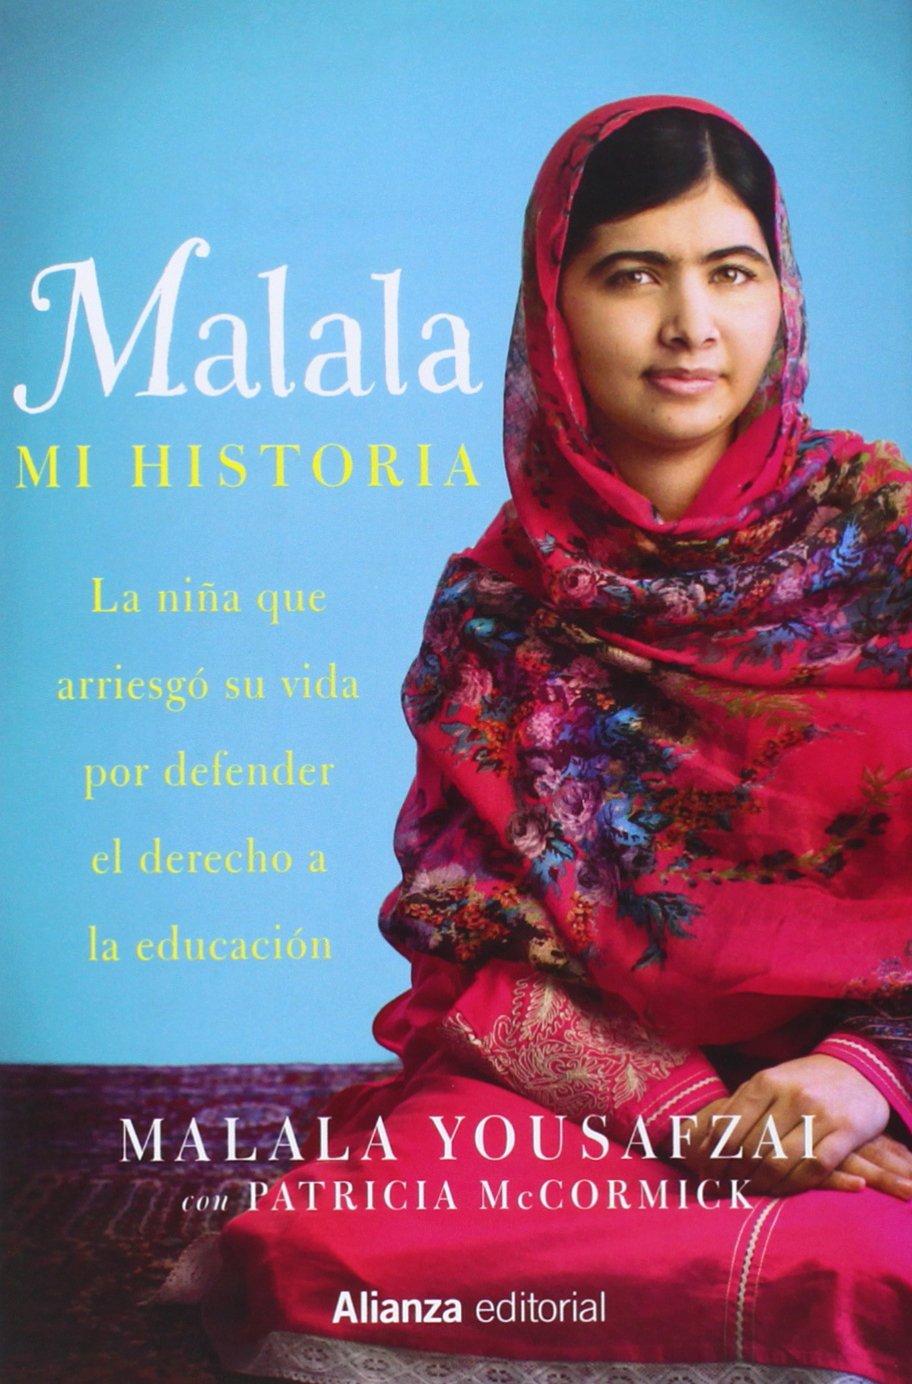 Malala. Mi Historia (Libros Singulares (Ls)) Tapa dura – 15 oct 2014 Malala Yousafzai Patricia McCormick Julia Fernández Alianza